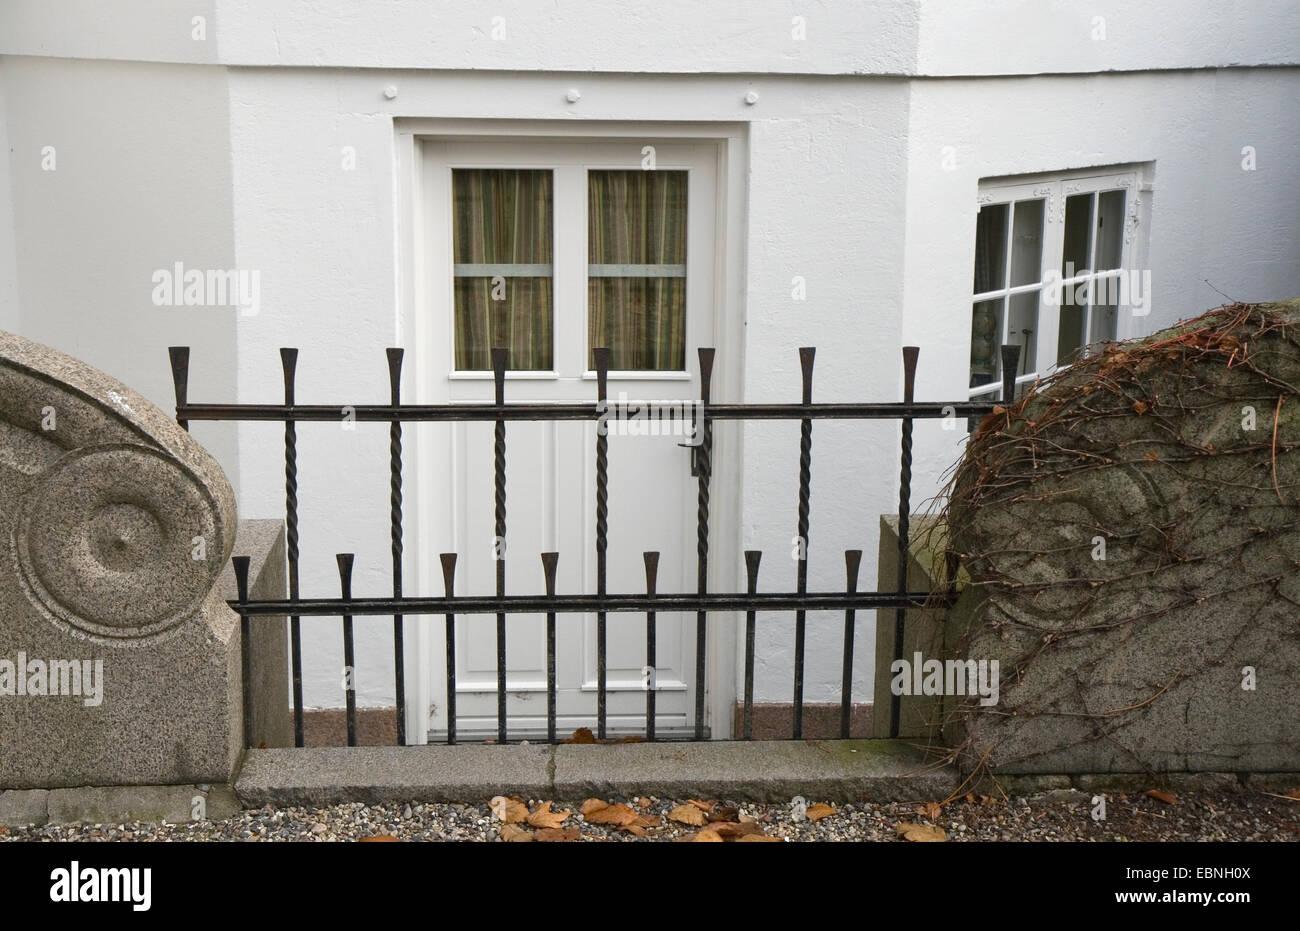 Basement door at the Royal Palace Marselisborg at Aarhus Denmark - Stock Image & Basement Door Stock Photos u0026 Basement Door Stock Images - Alamy